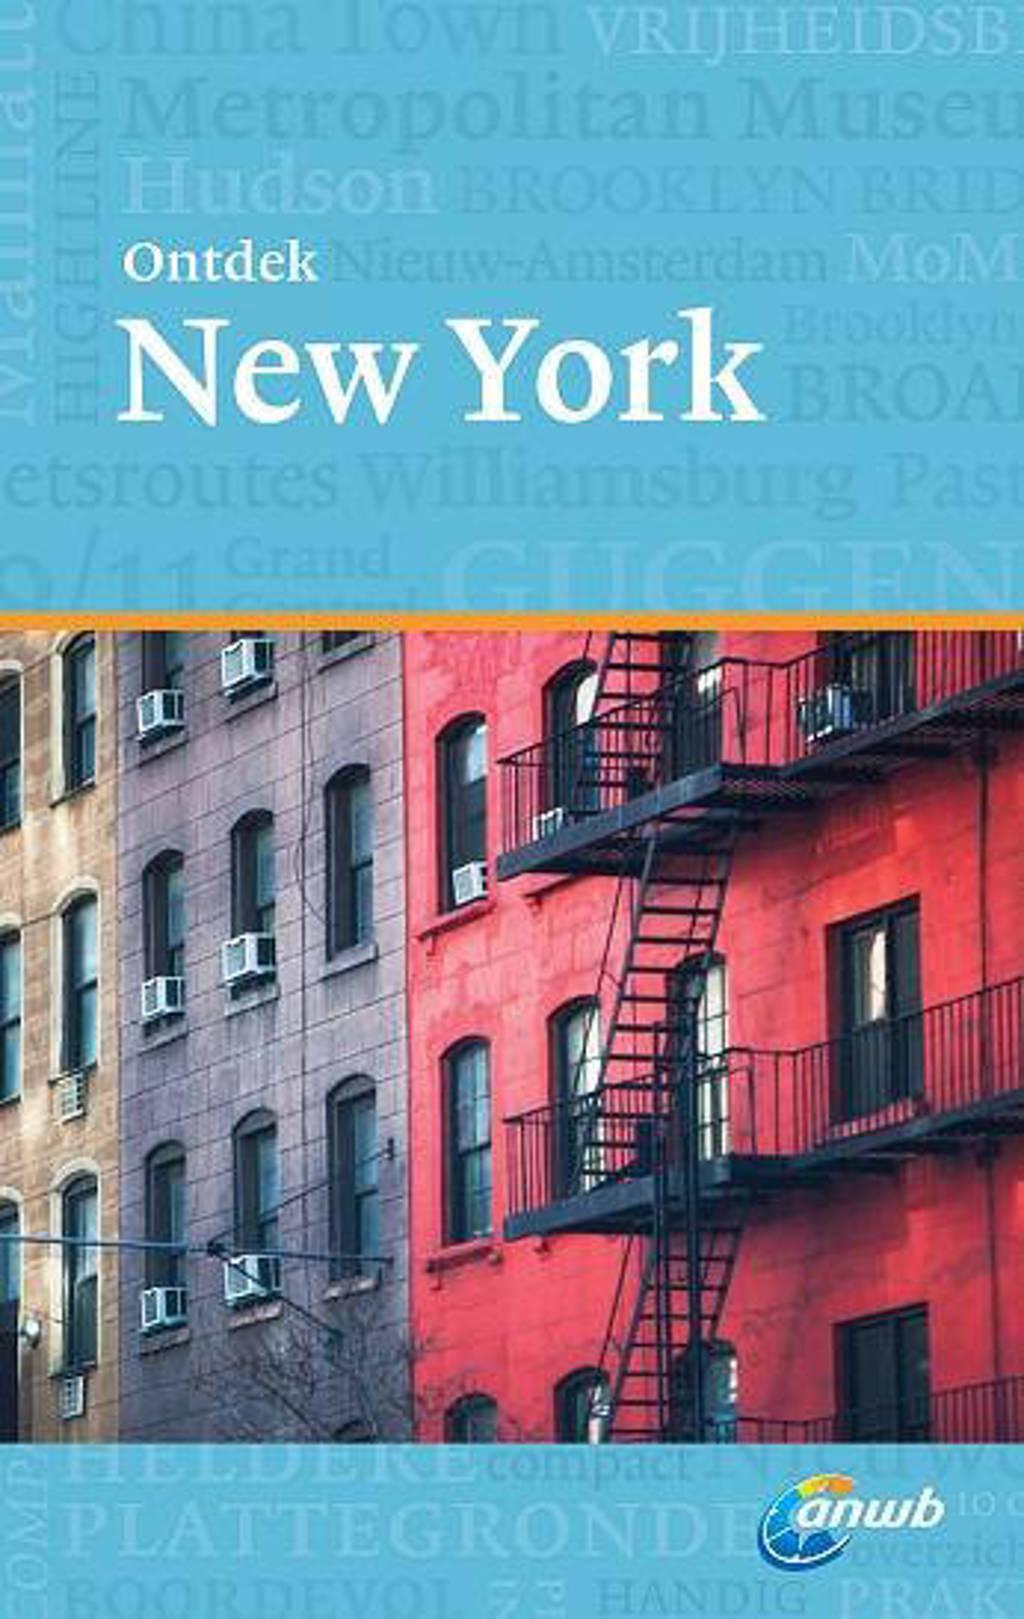 ANWB ontdek: New York